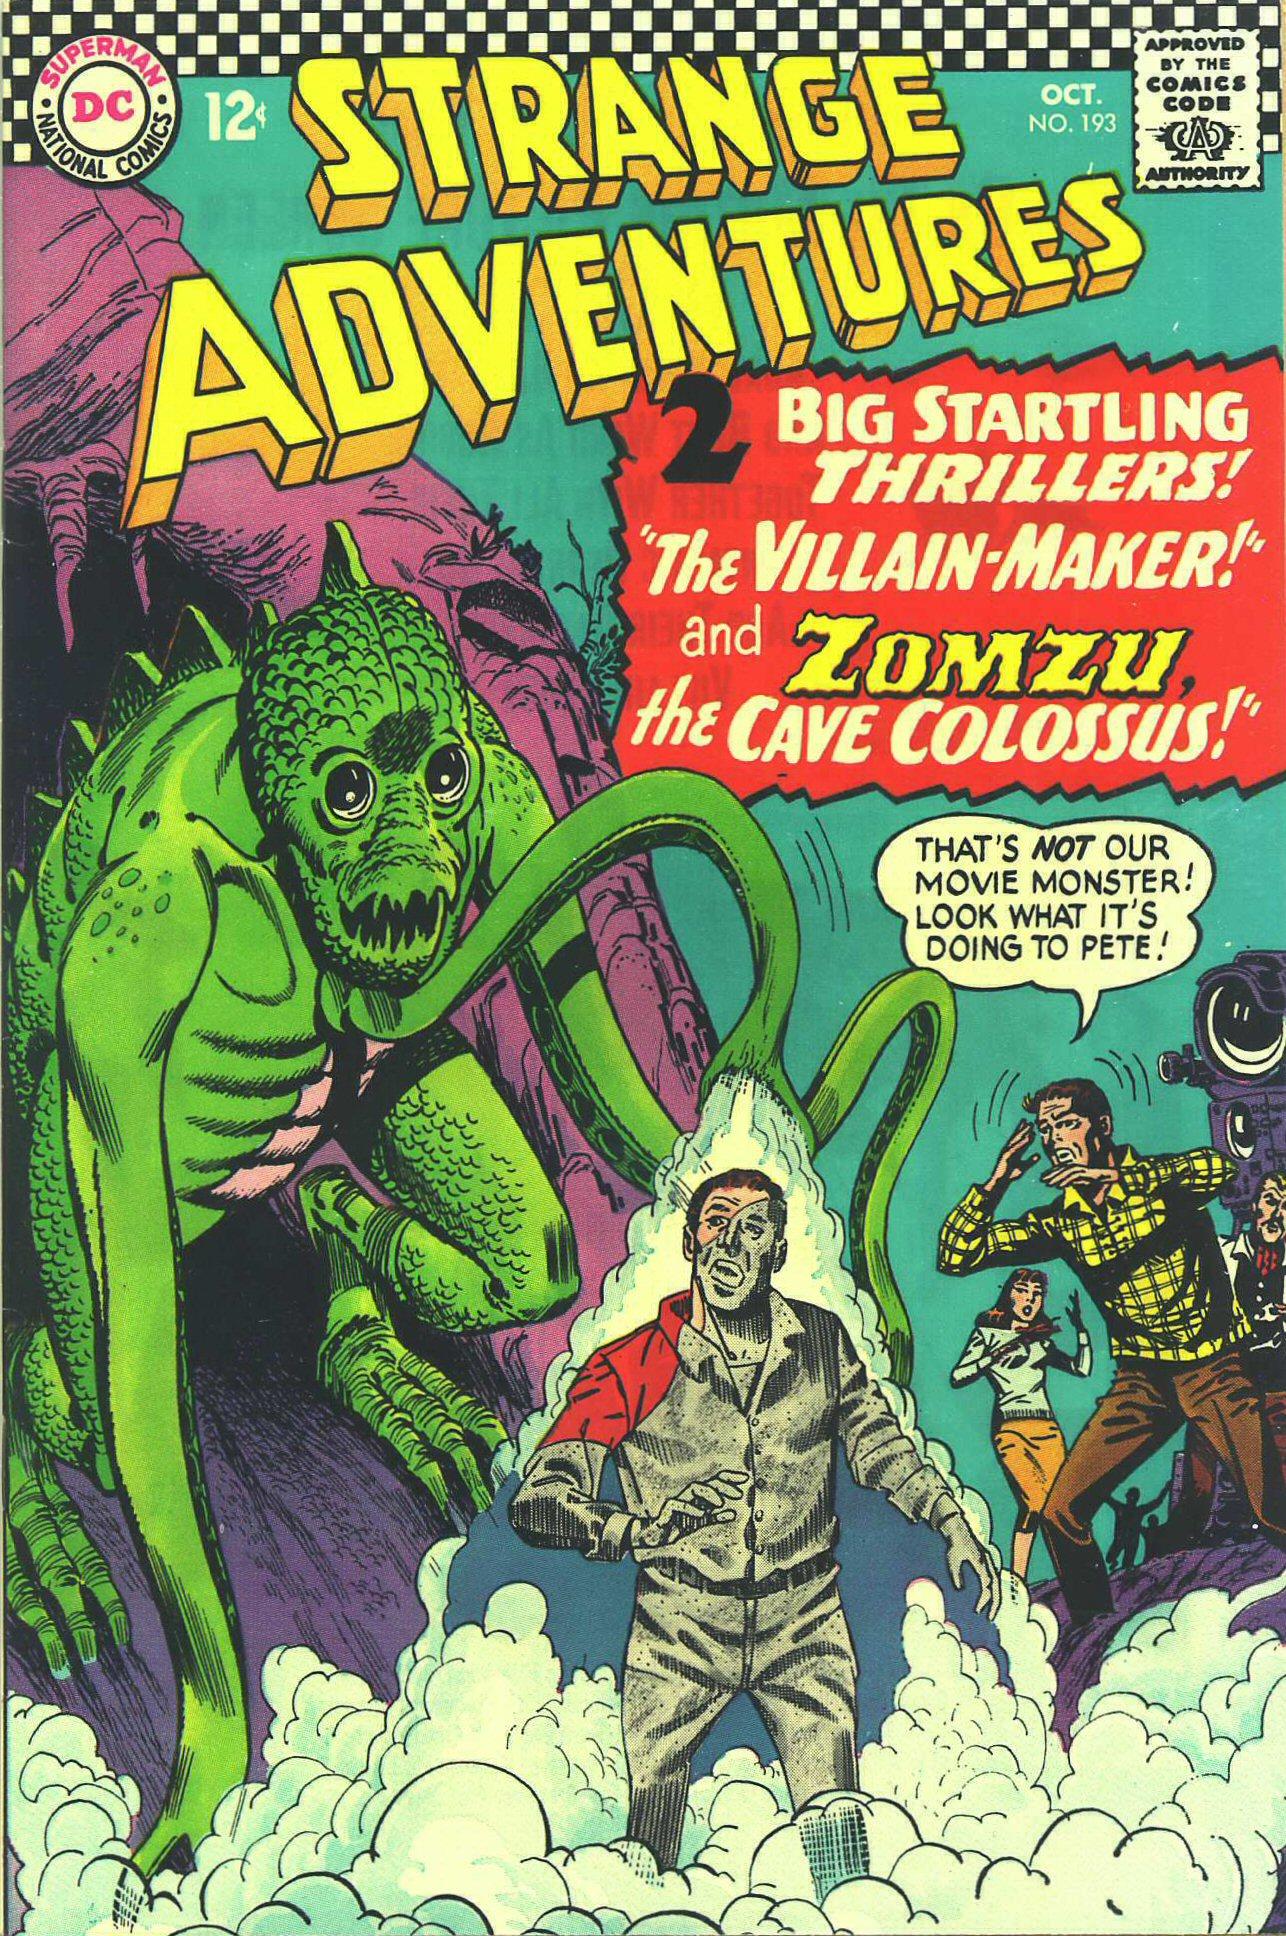 Strange Adventures (1950) issue 193 - Page 1